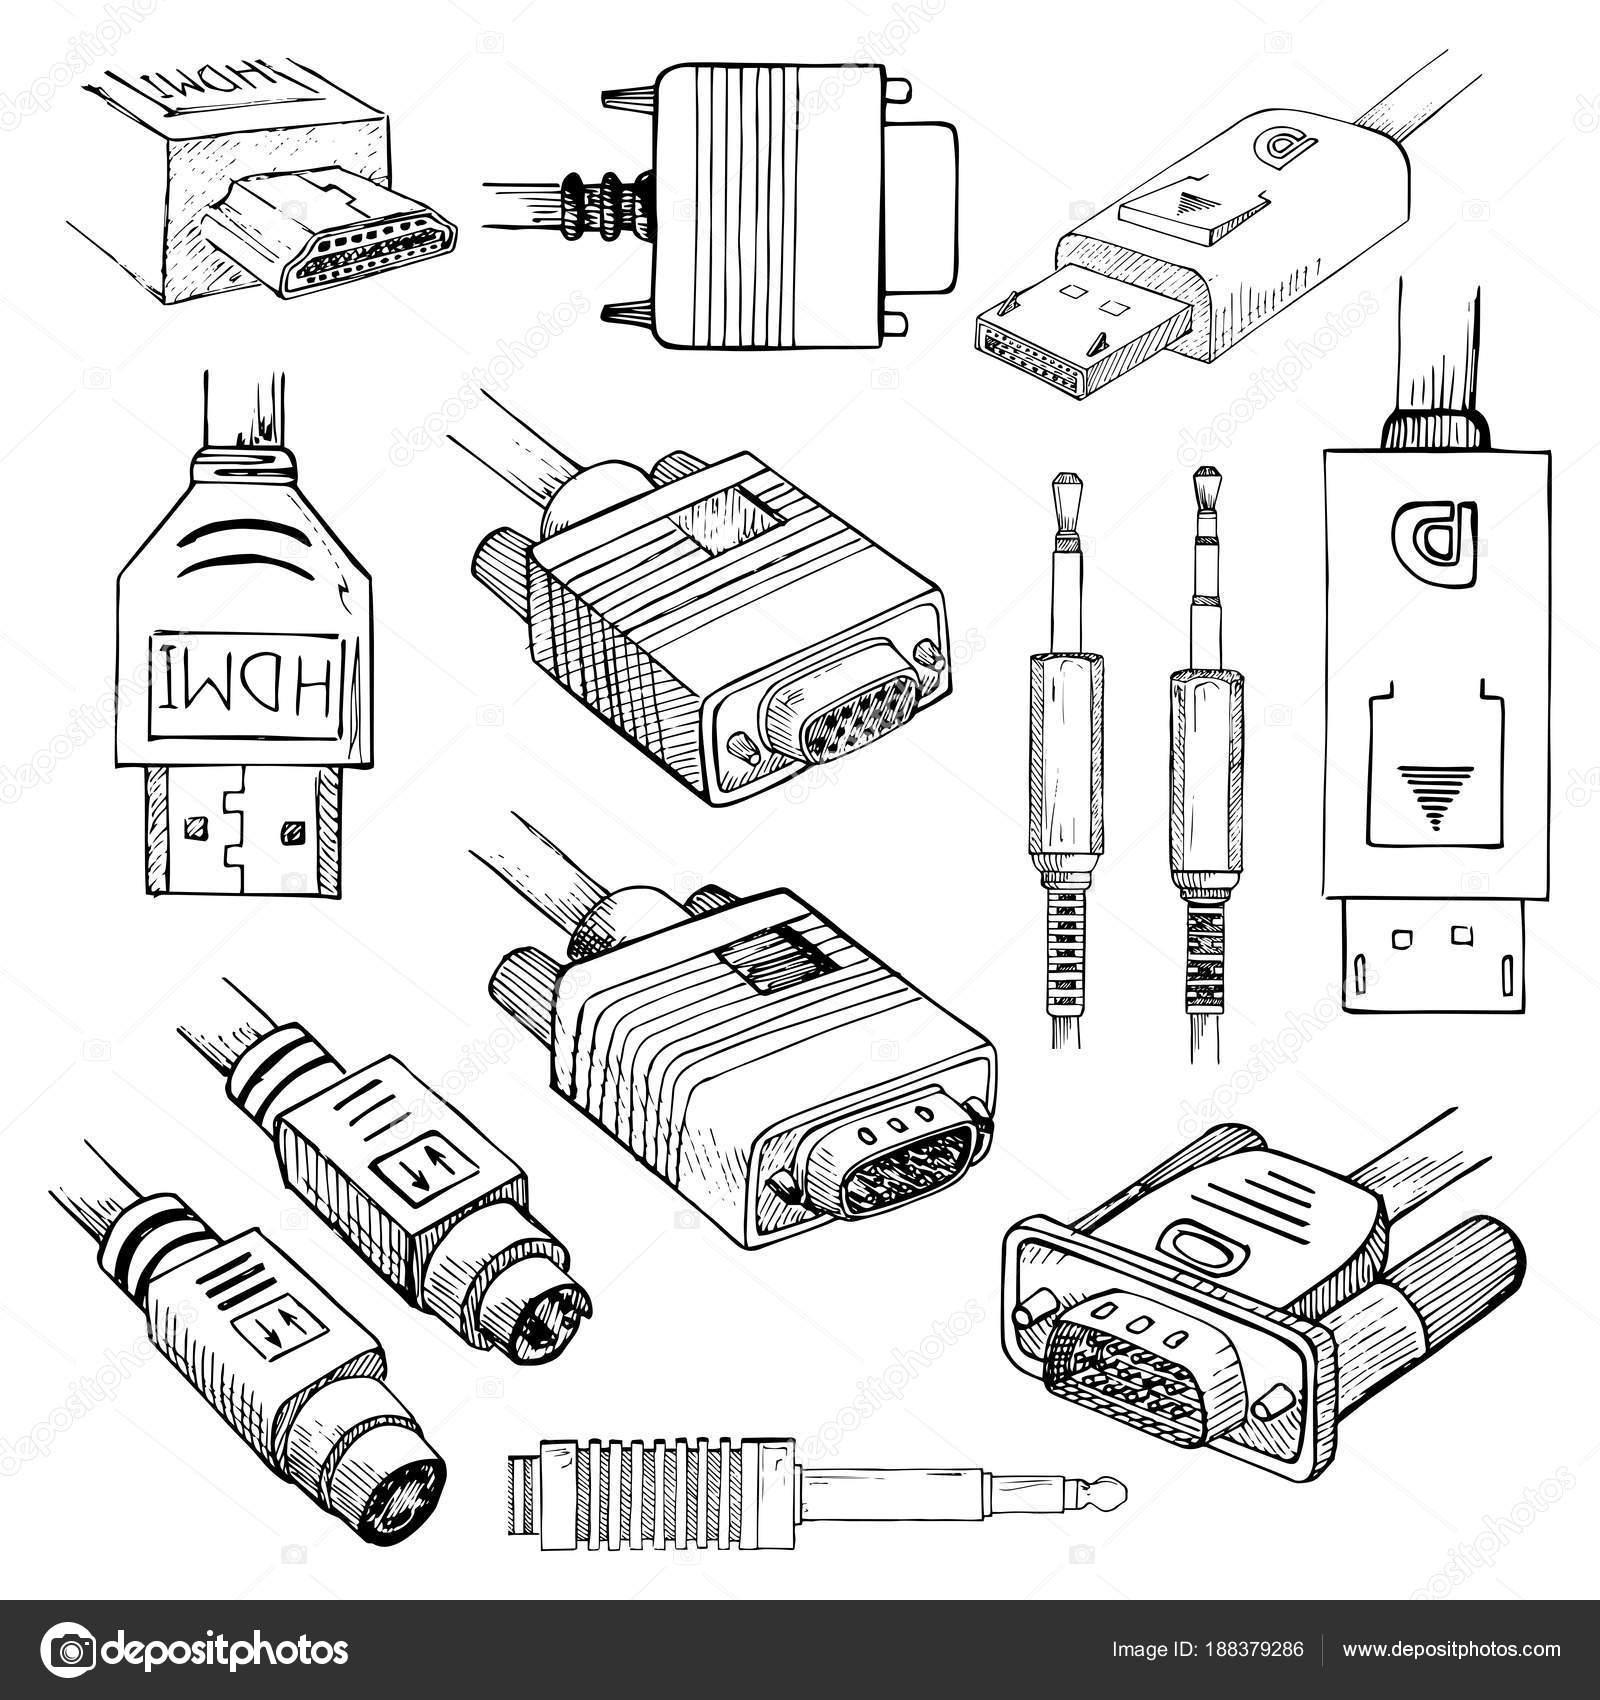 Hdmi Cable Schematic Diagram